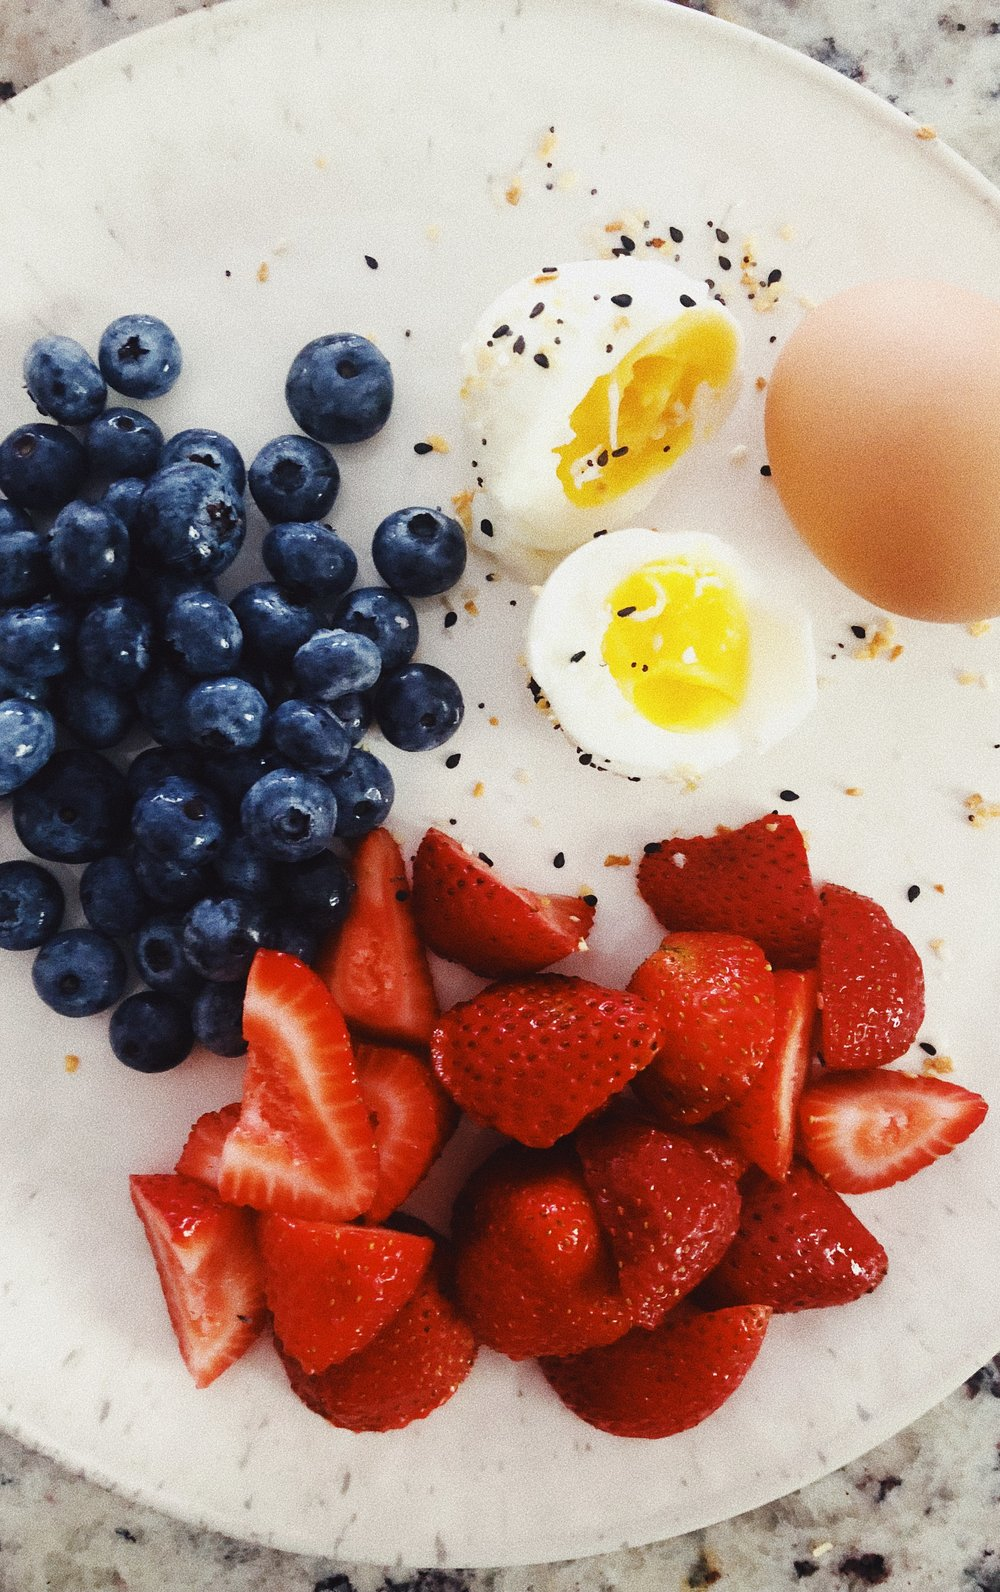 hardboiled eggs and fruit